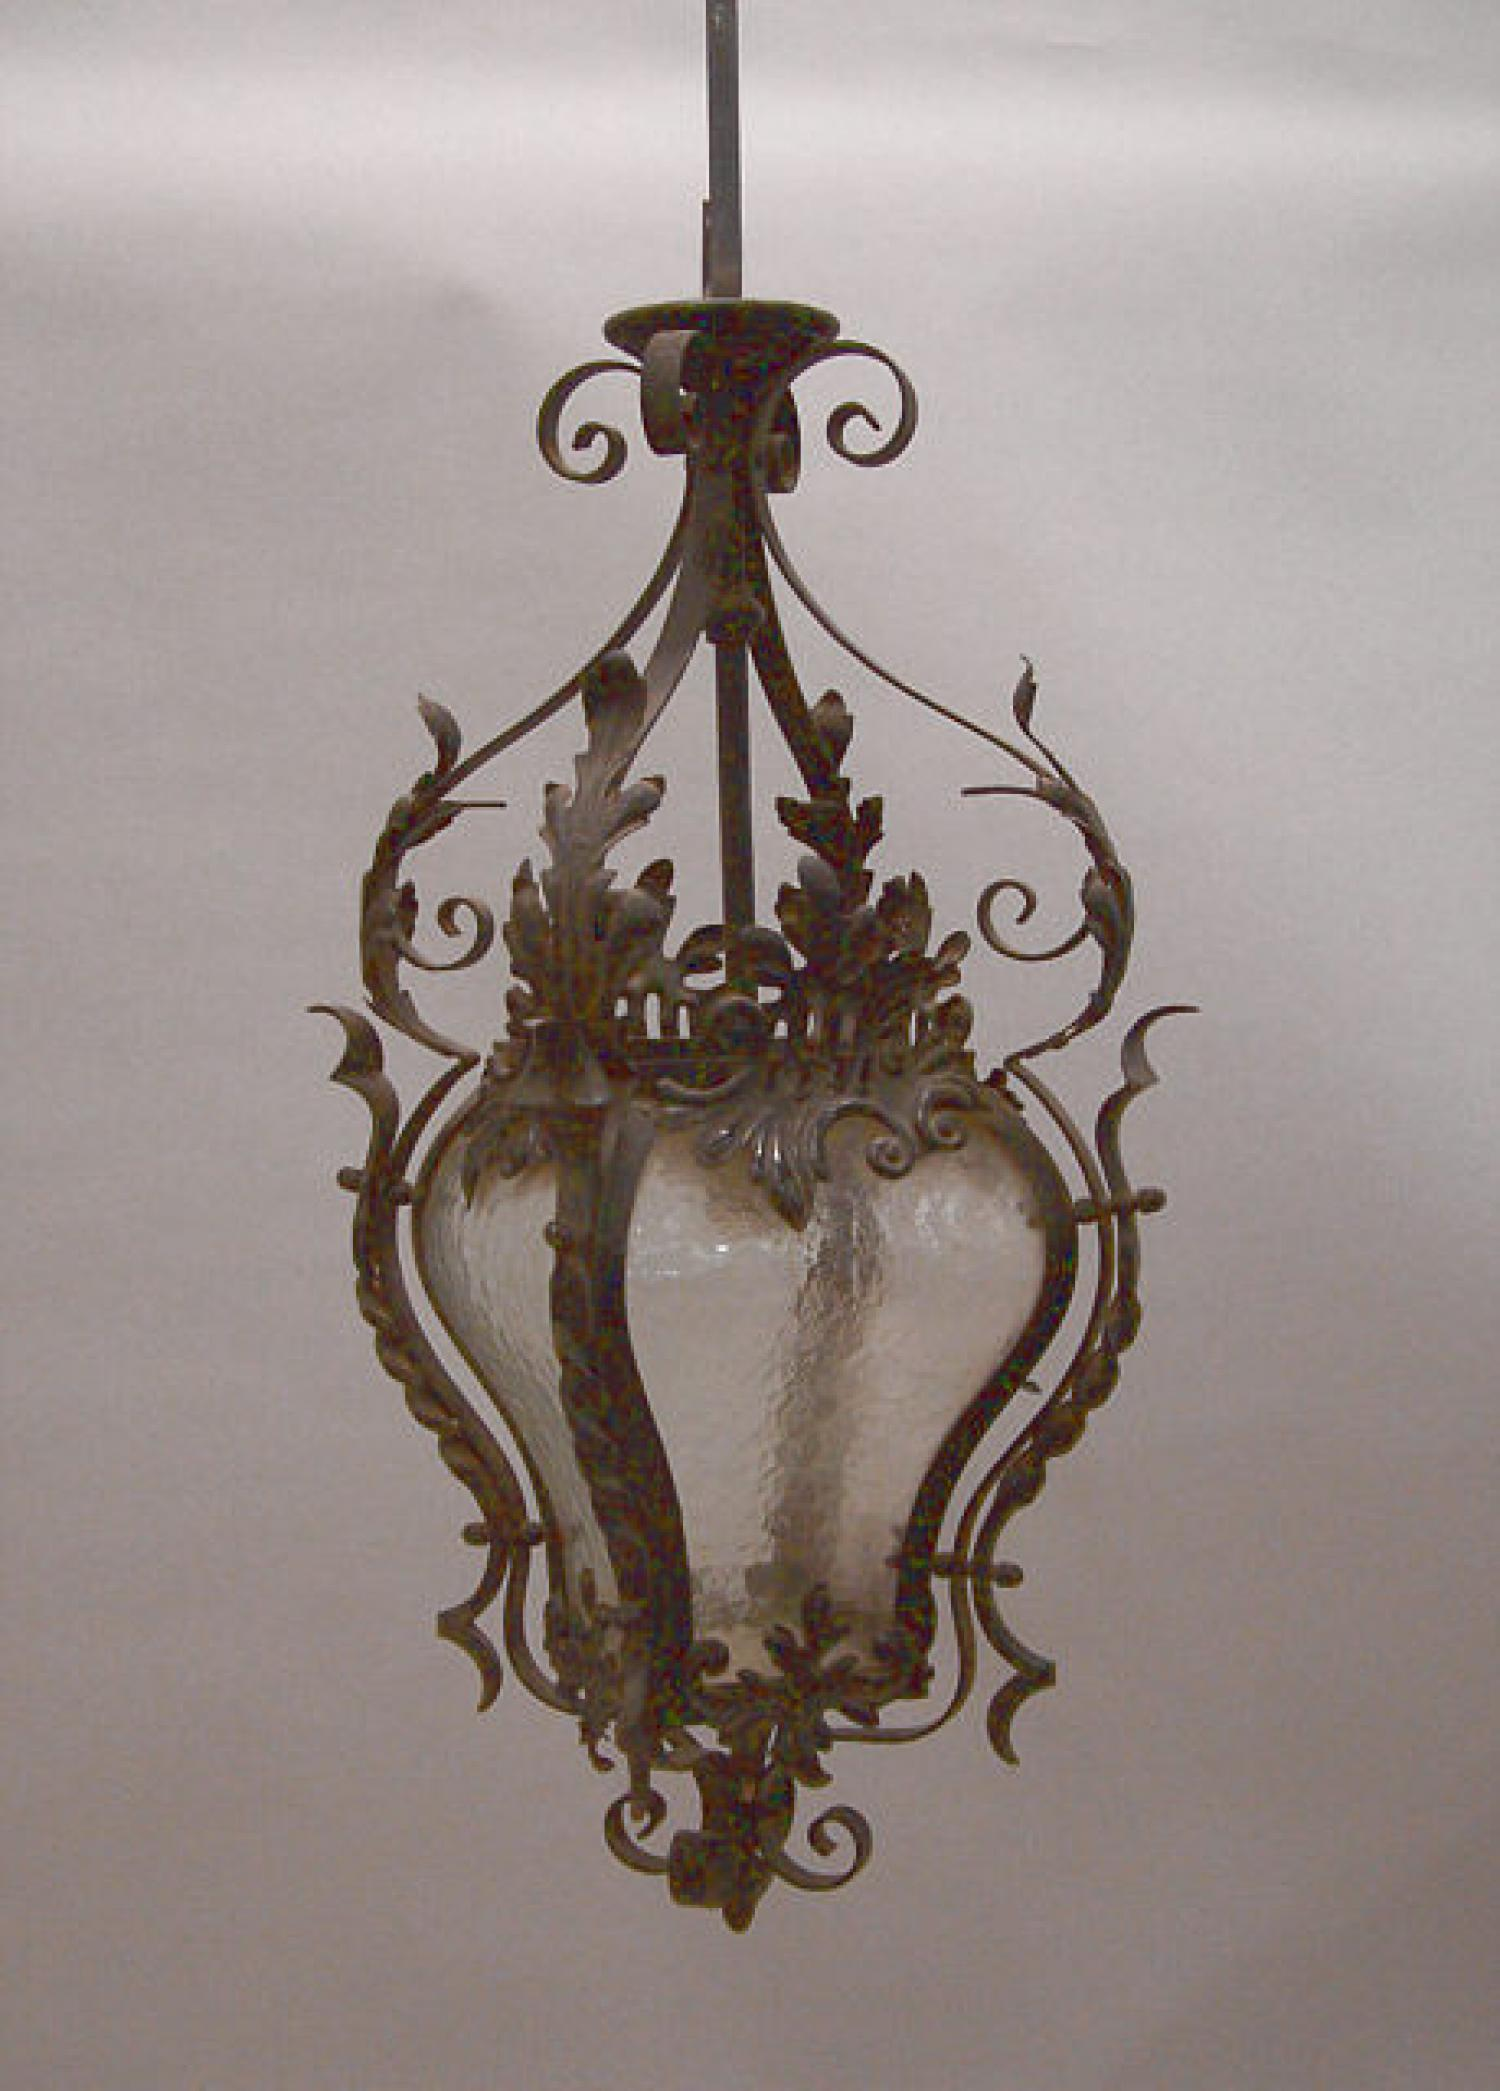 French wrought iron porte cochere lantern c1920